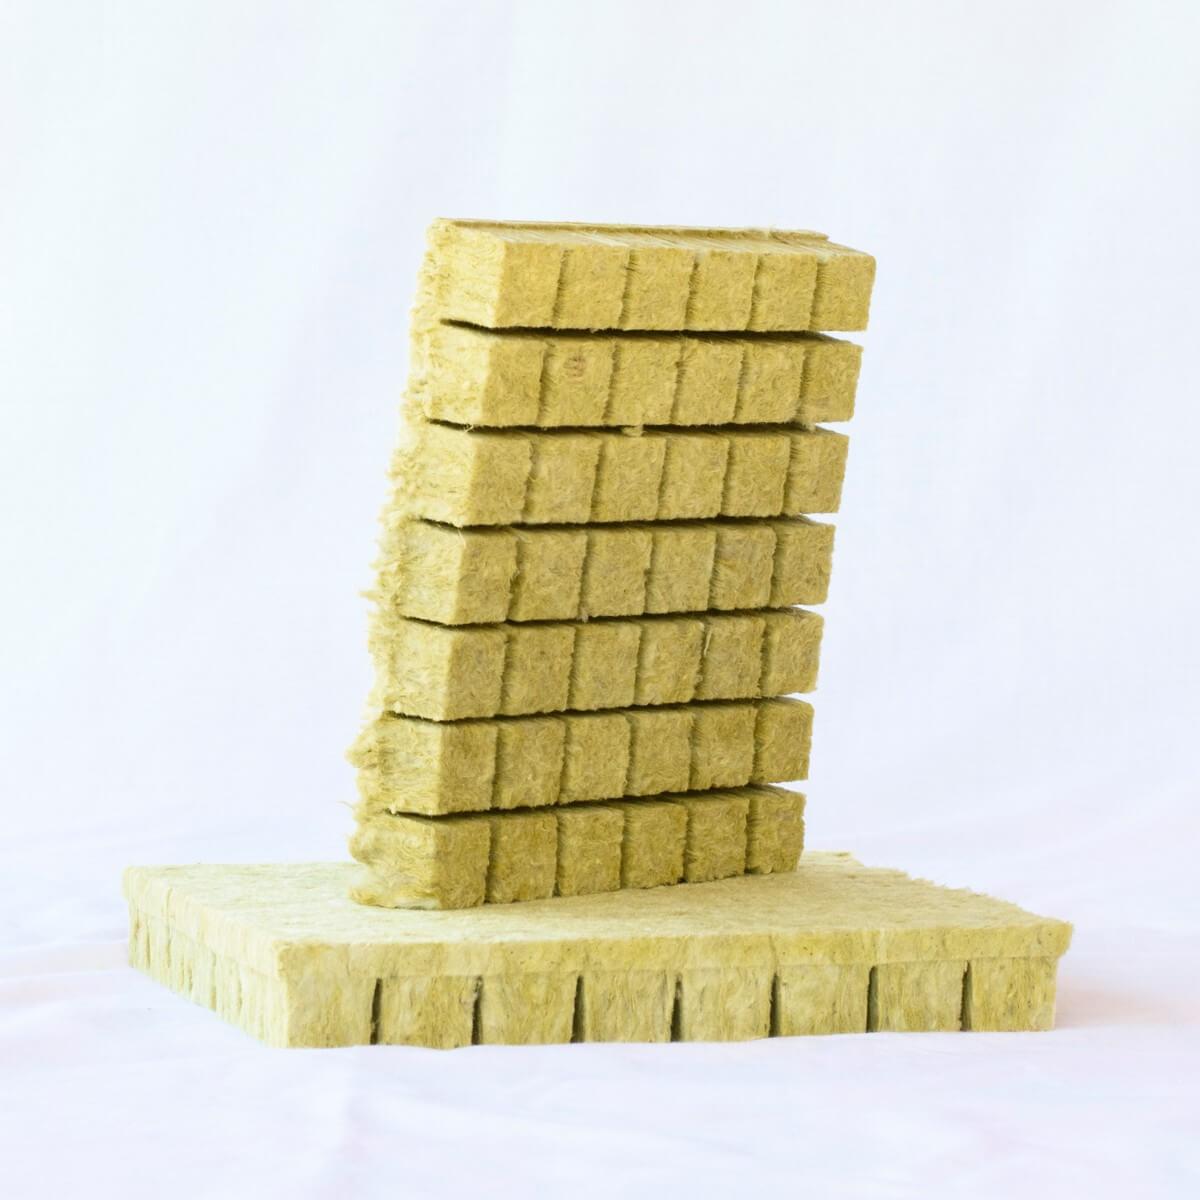 Magvető kőzetgyapot kocka 25x25x40 galéria